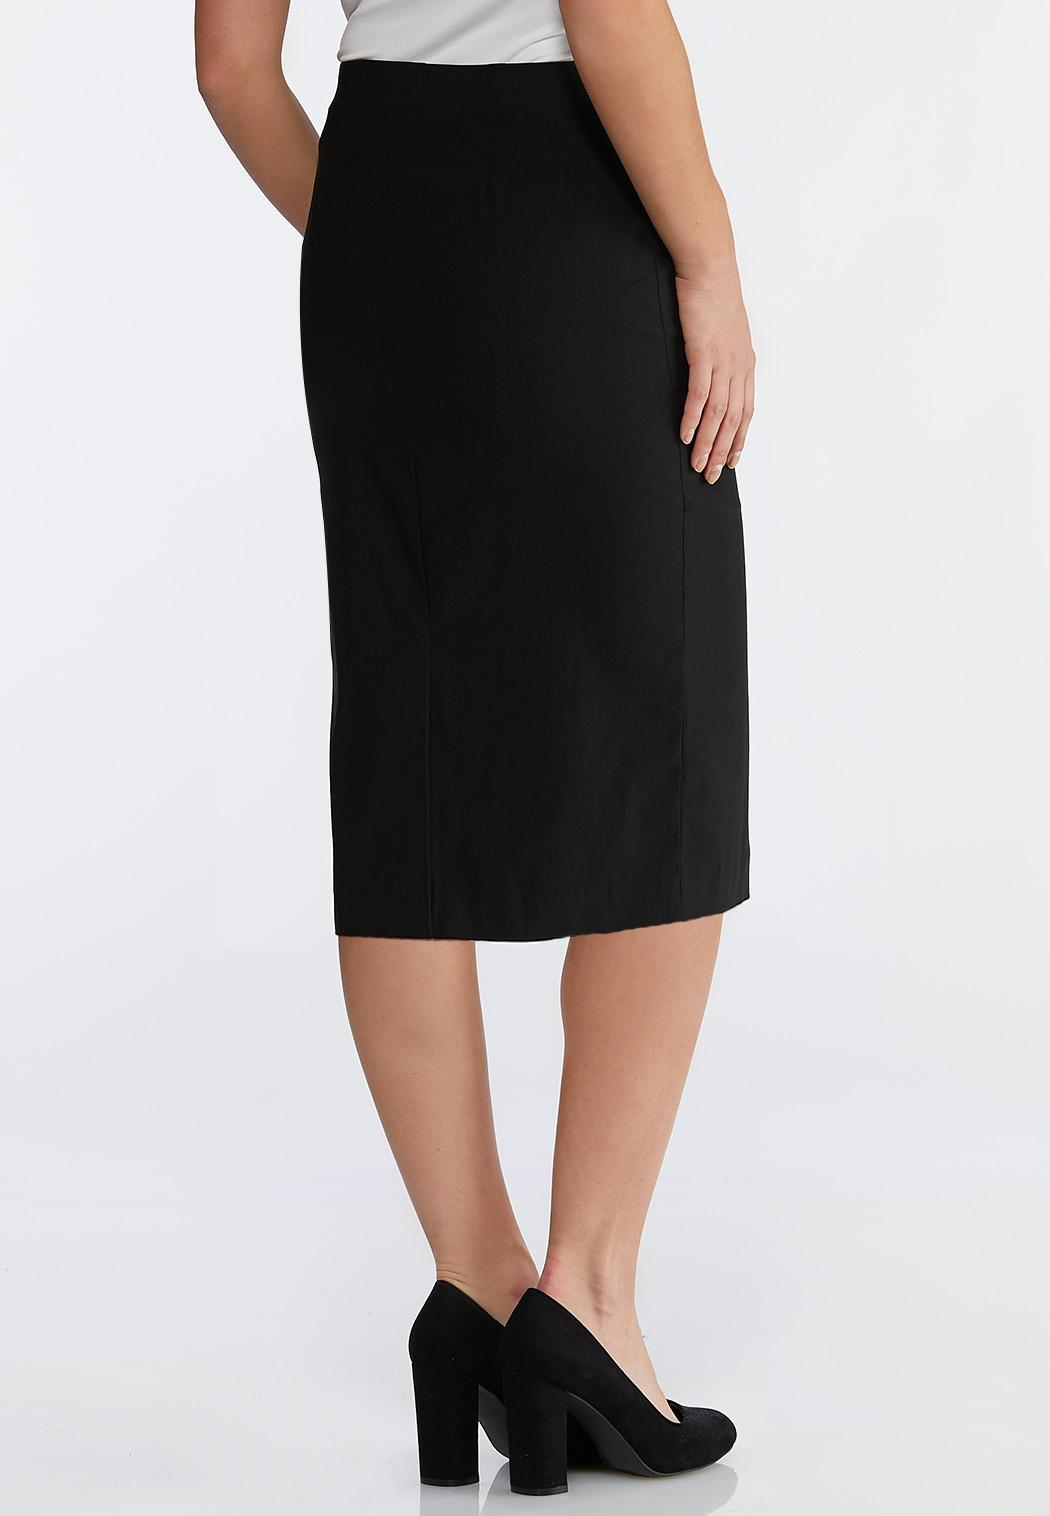 Plus Size Bengaline Pencil Skirt (Item #43731673)